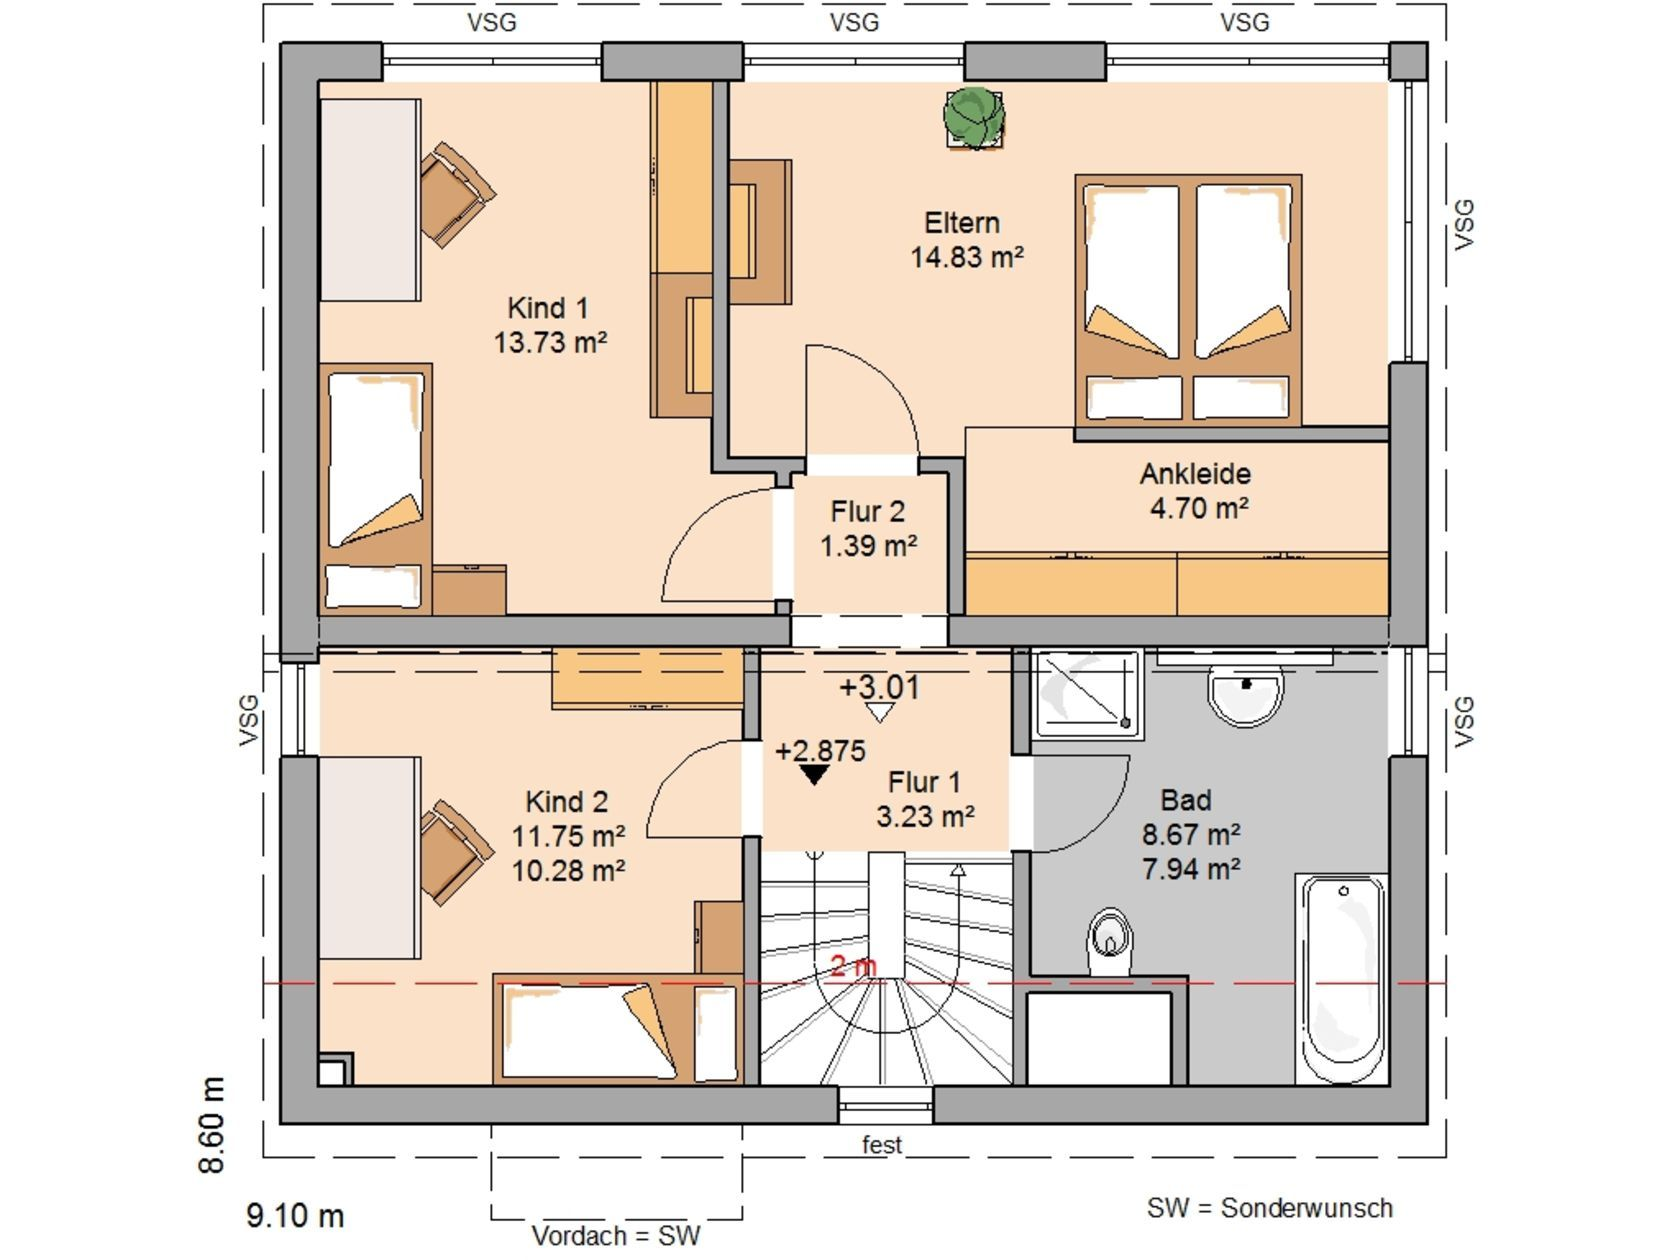 Perfect Explore Plans And More! Kern Haus Familienhaus Vision Plus Grundriss  Dachgeschoss